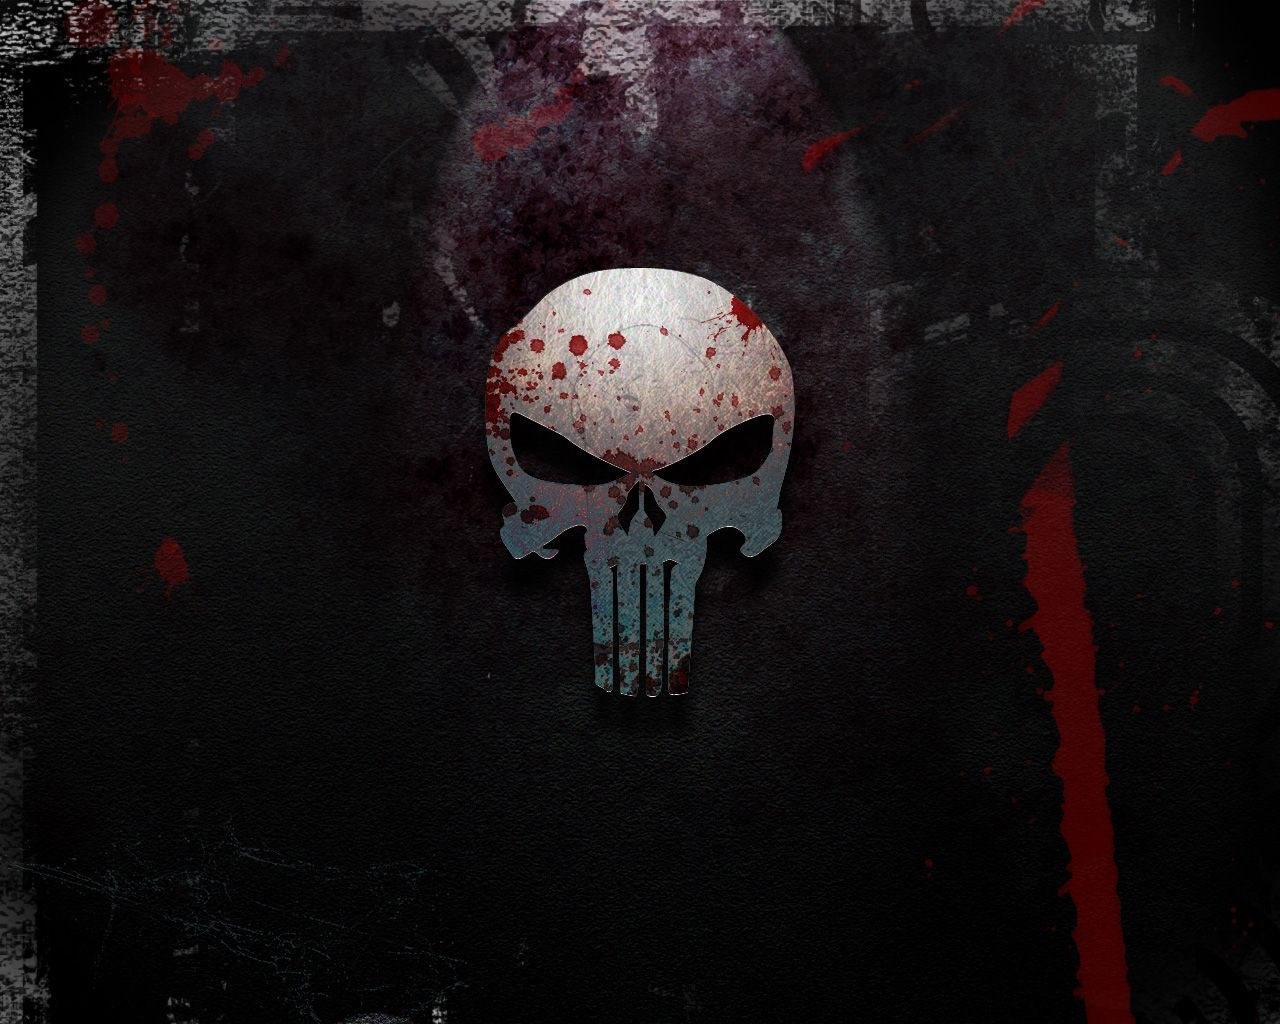 Punisher Skull Wallpapers Top Free Punisher Skull Backgrounds